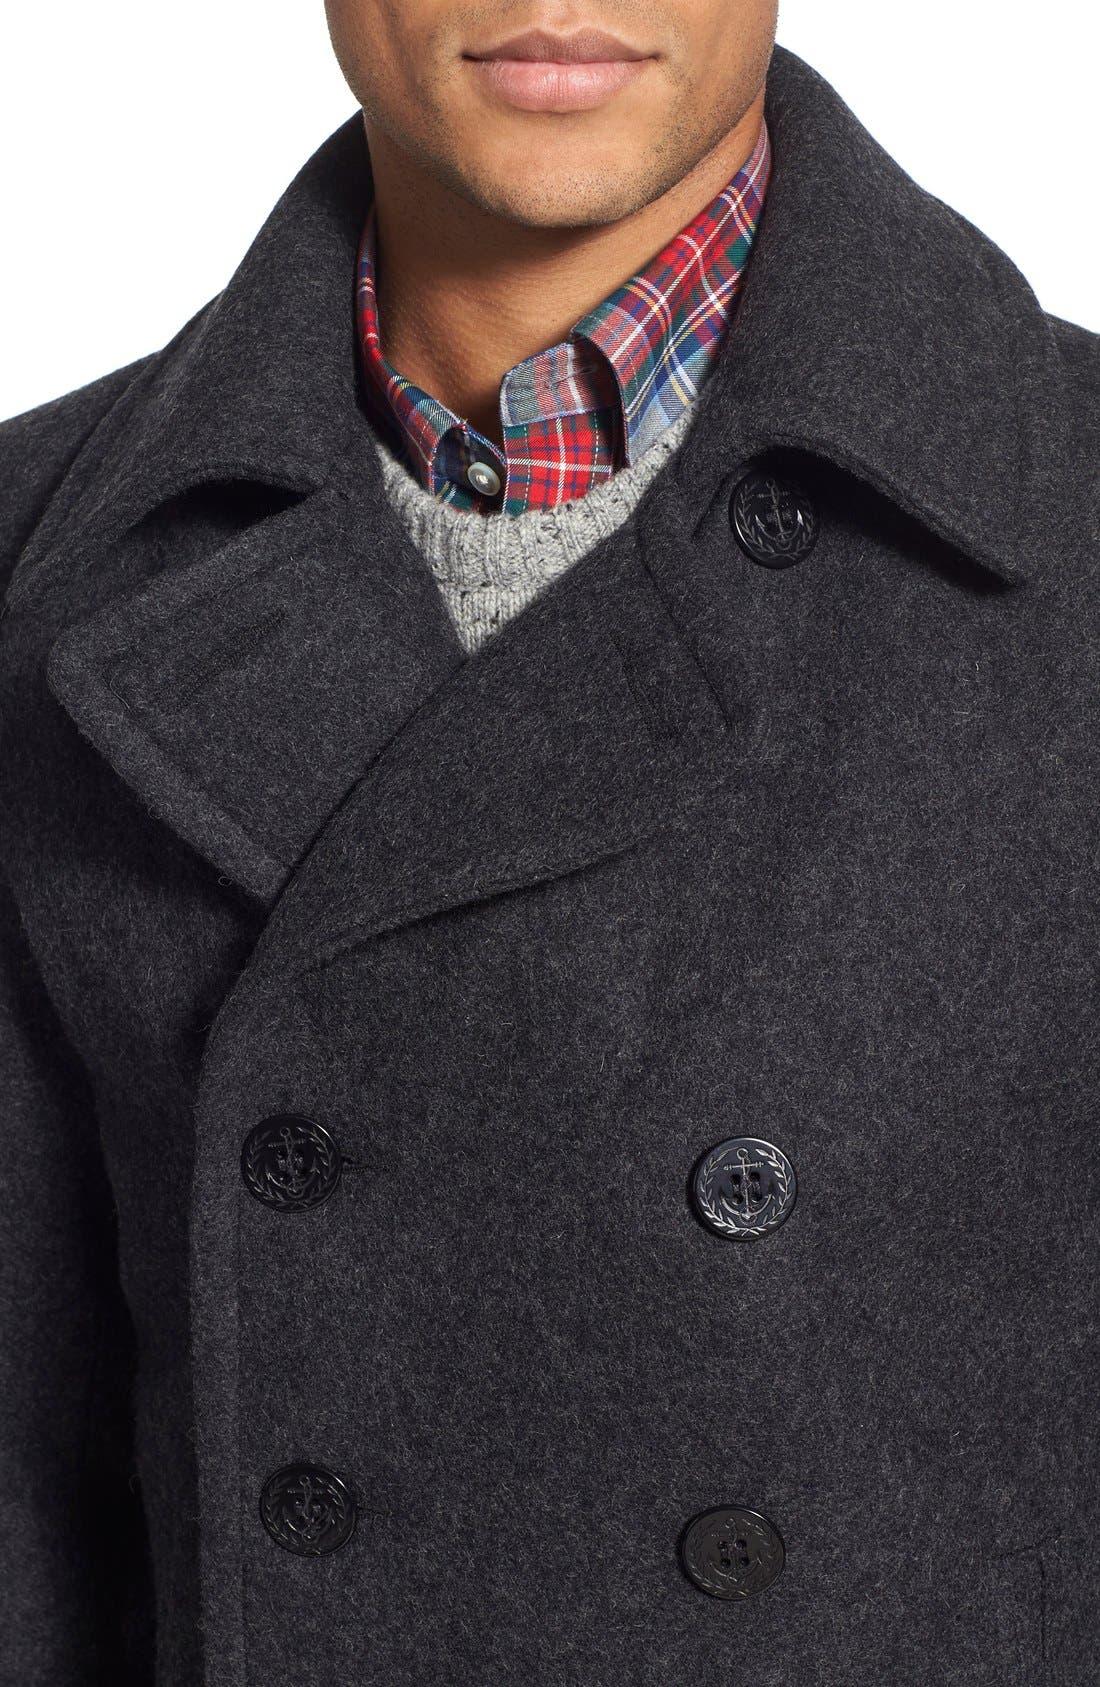 Slim Fit Wool Blend Peacoat,                             Alternate thumbnail 4, color,                             Dark Oxford Grey